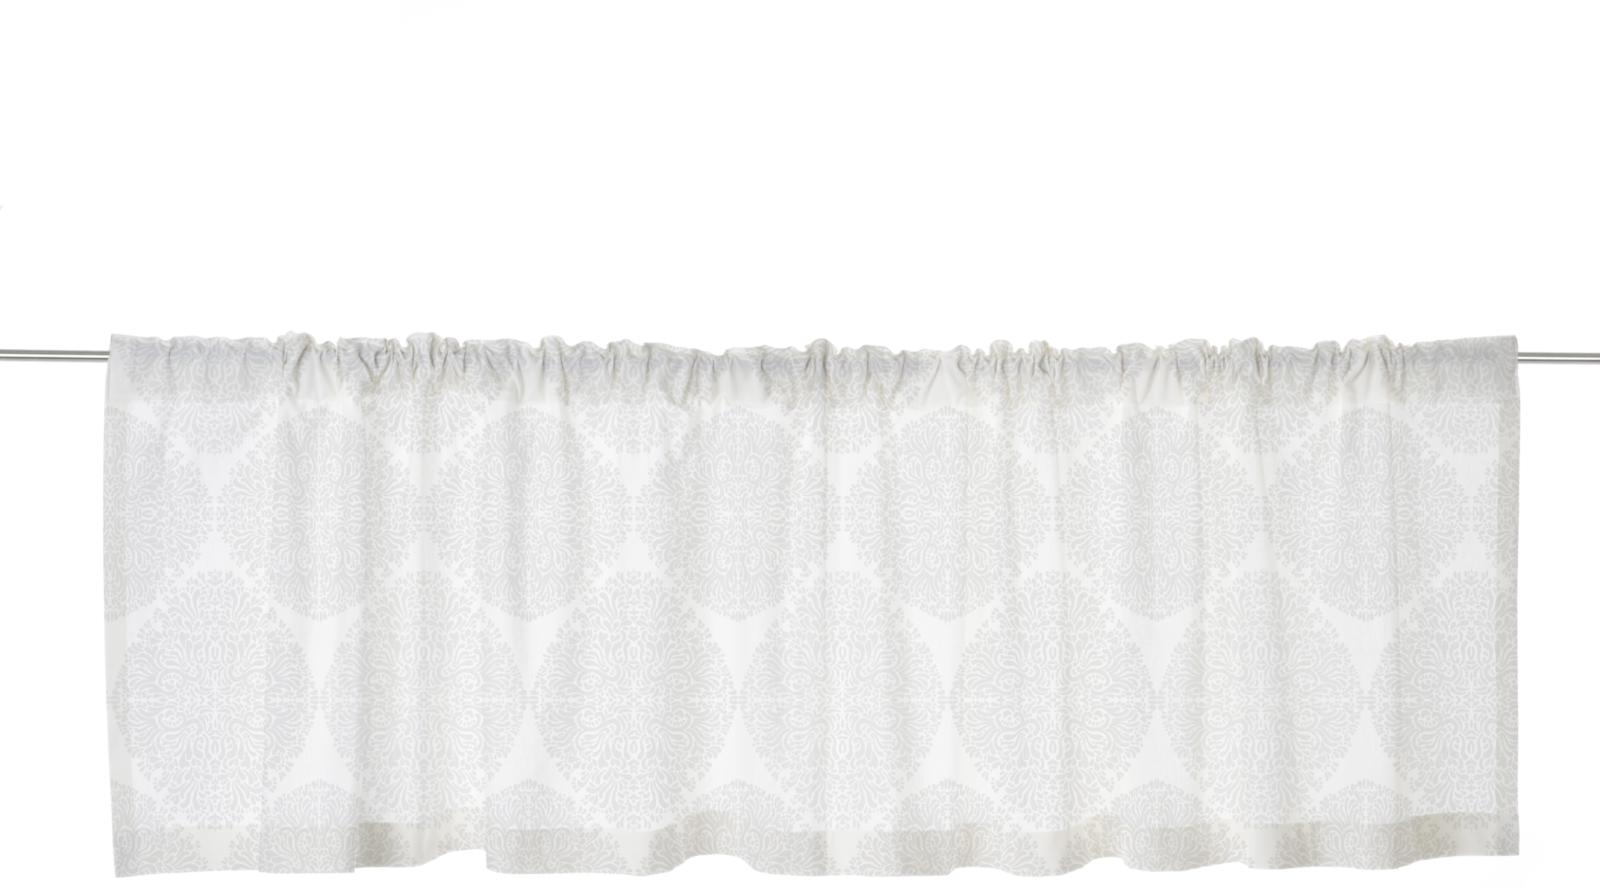 Kappa Vallila Hiutale Fancy 60x250cm valkoinen - Vallila - Taloon.com ccee6187c1